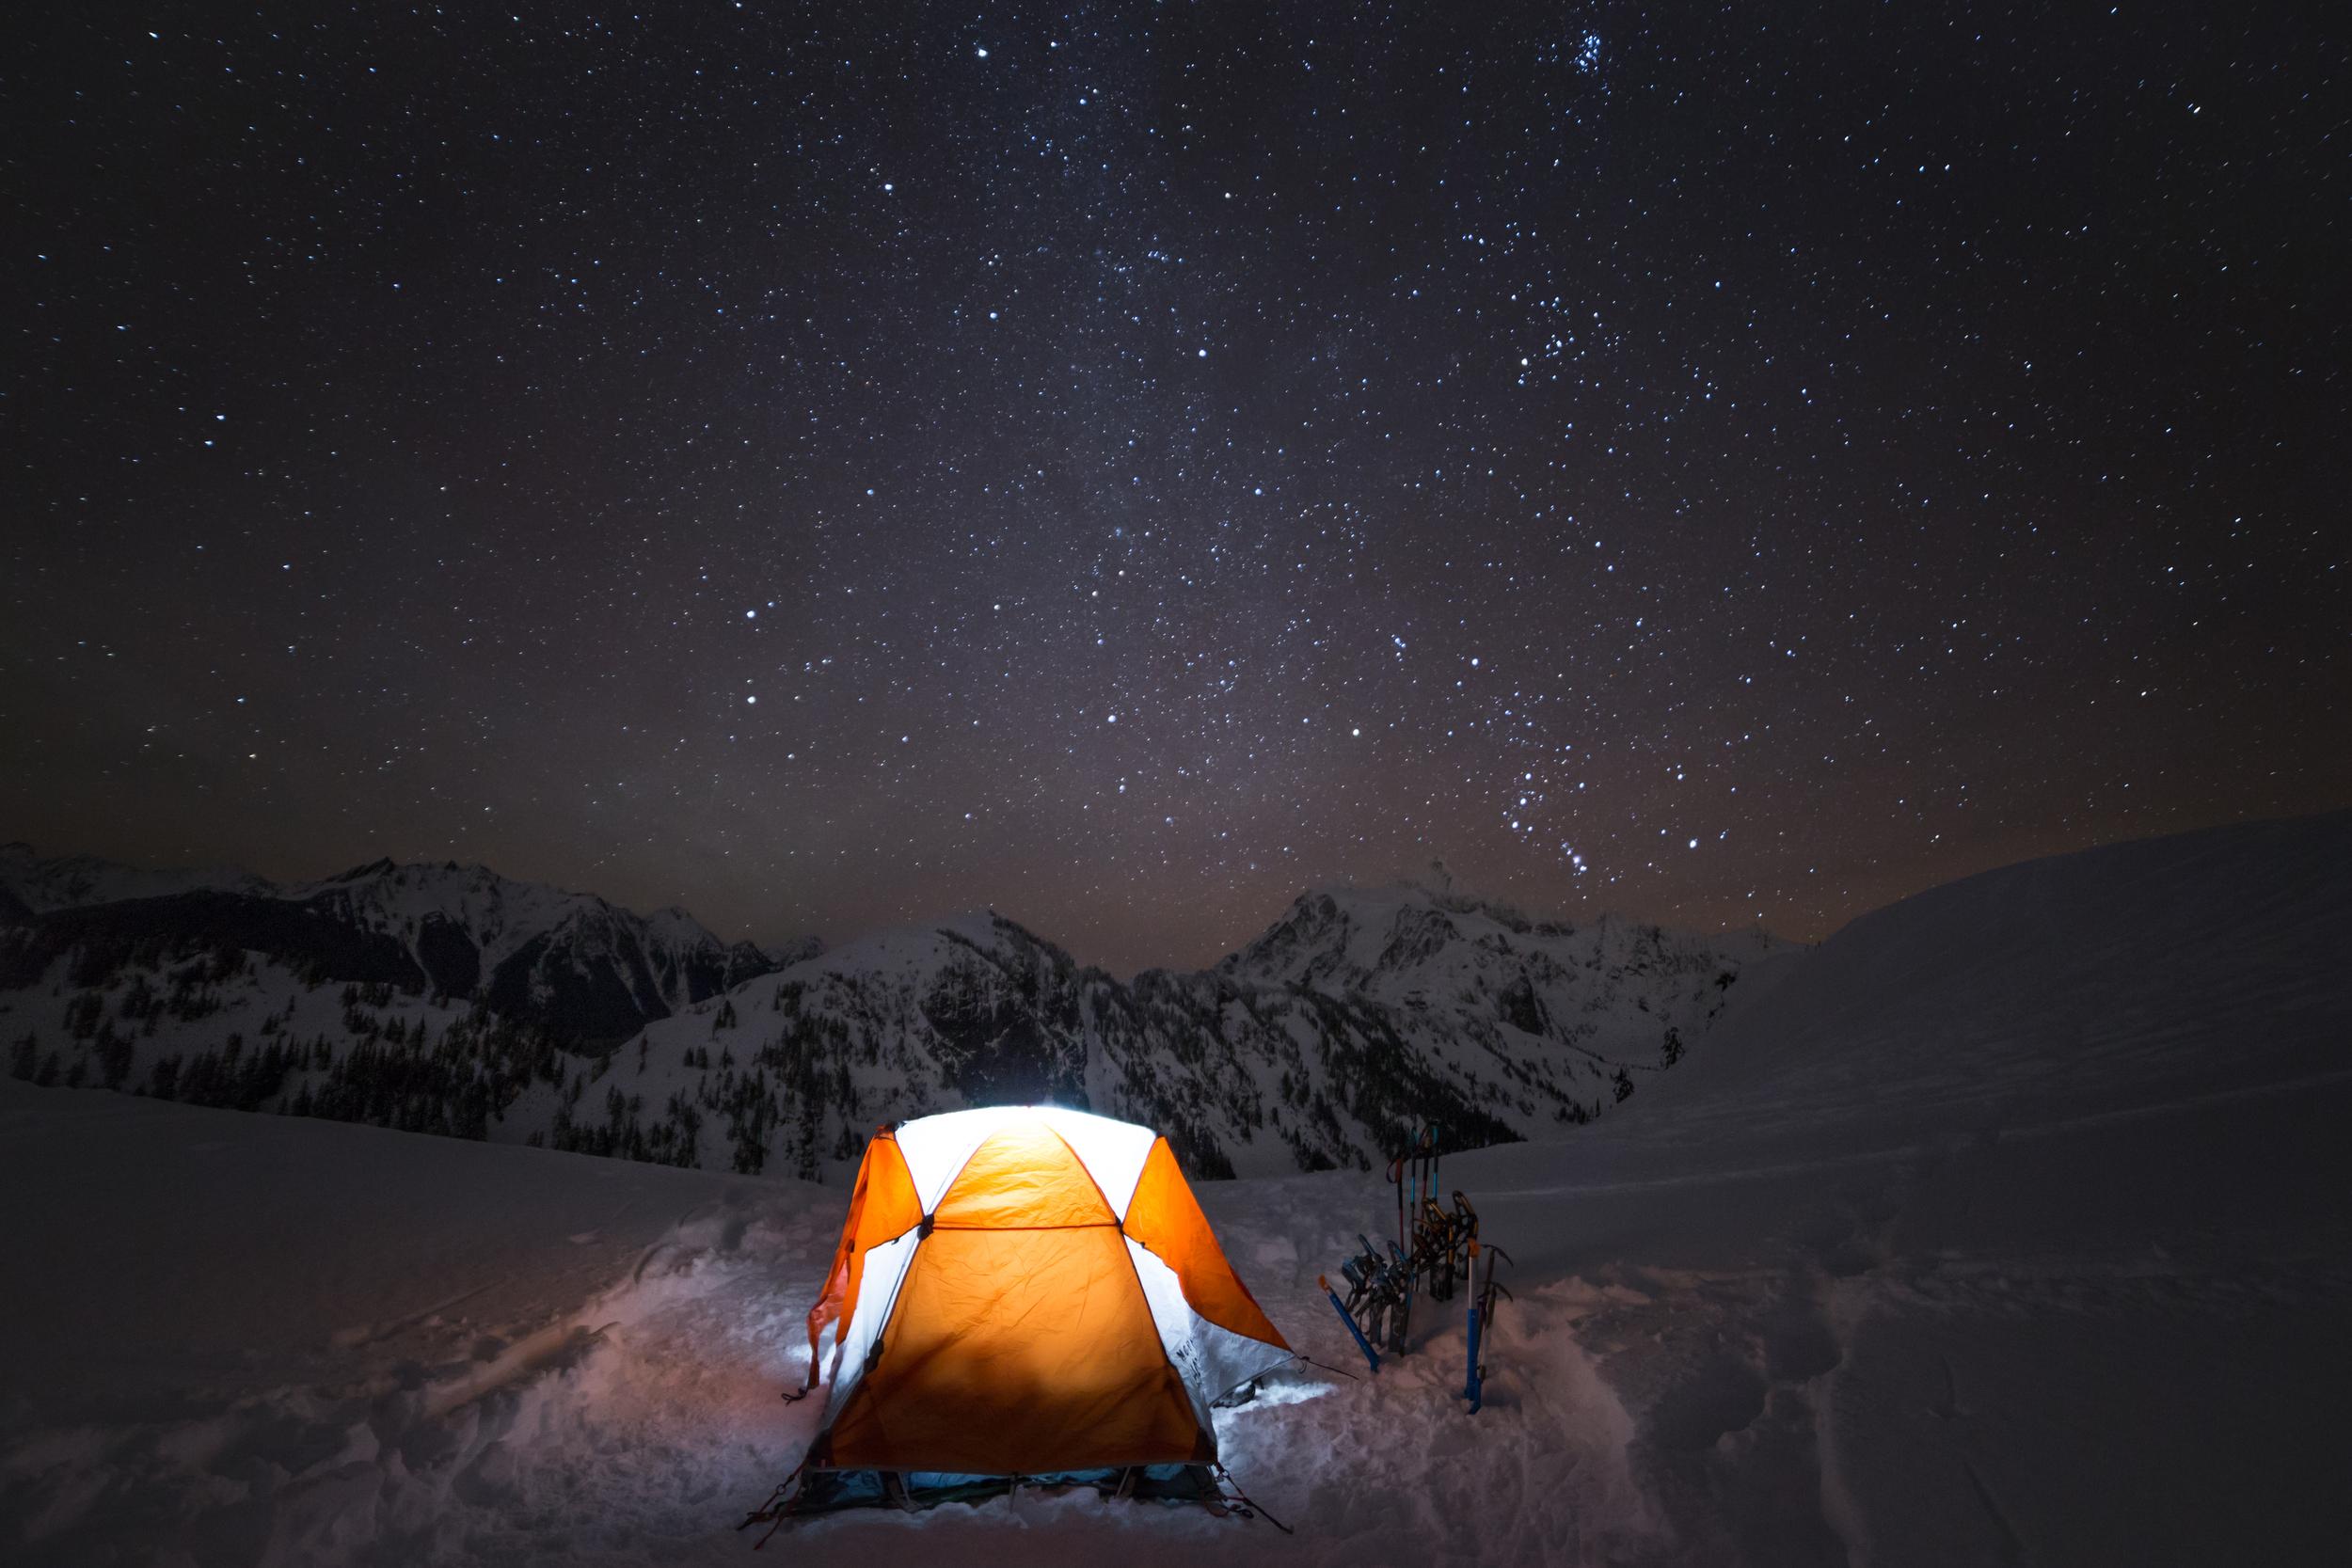 the national parks girl_mt baker_winter hike_snowshoe_north cascades_mountain hardwear_tangent2_artist point_long exposure_night photography.JPG